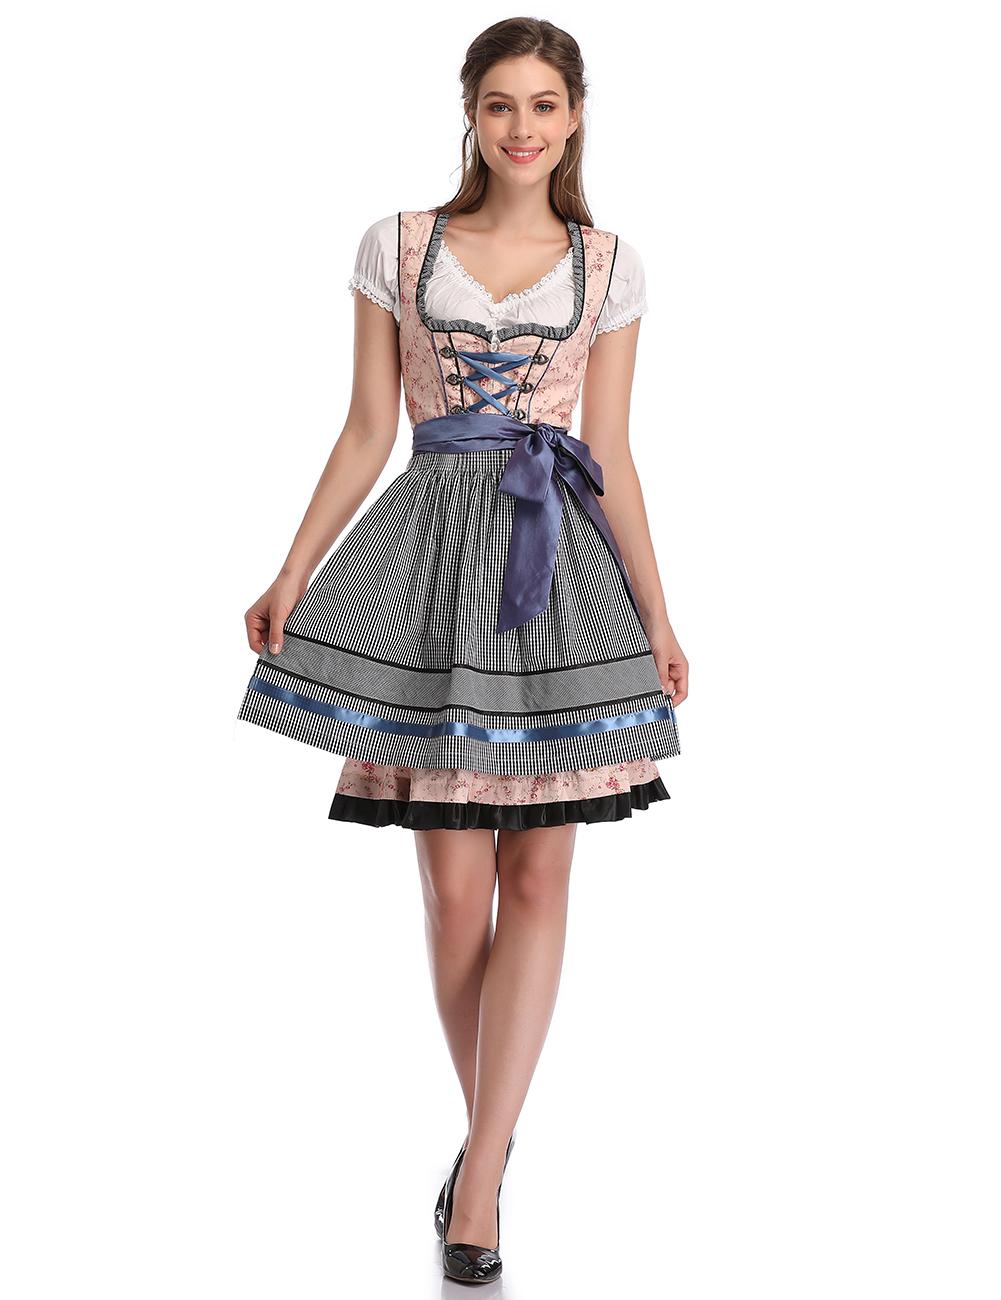 KOJOOIN Women's Vintage German Dirndl Dress Costumes for Bavarian Oktoberfest Halloween Carnival